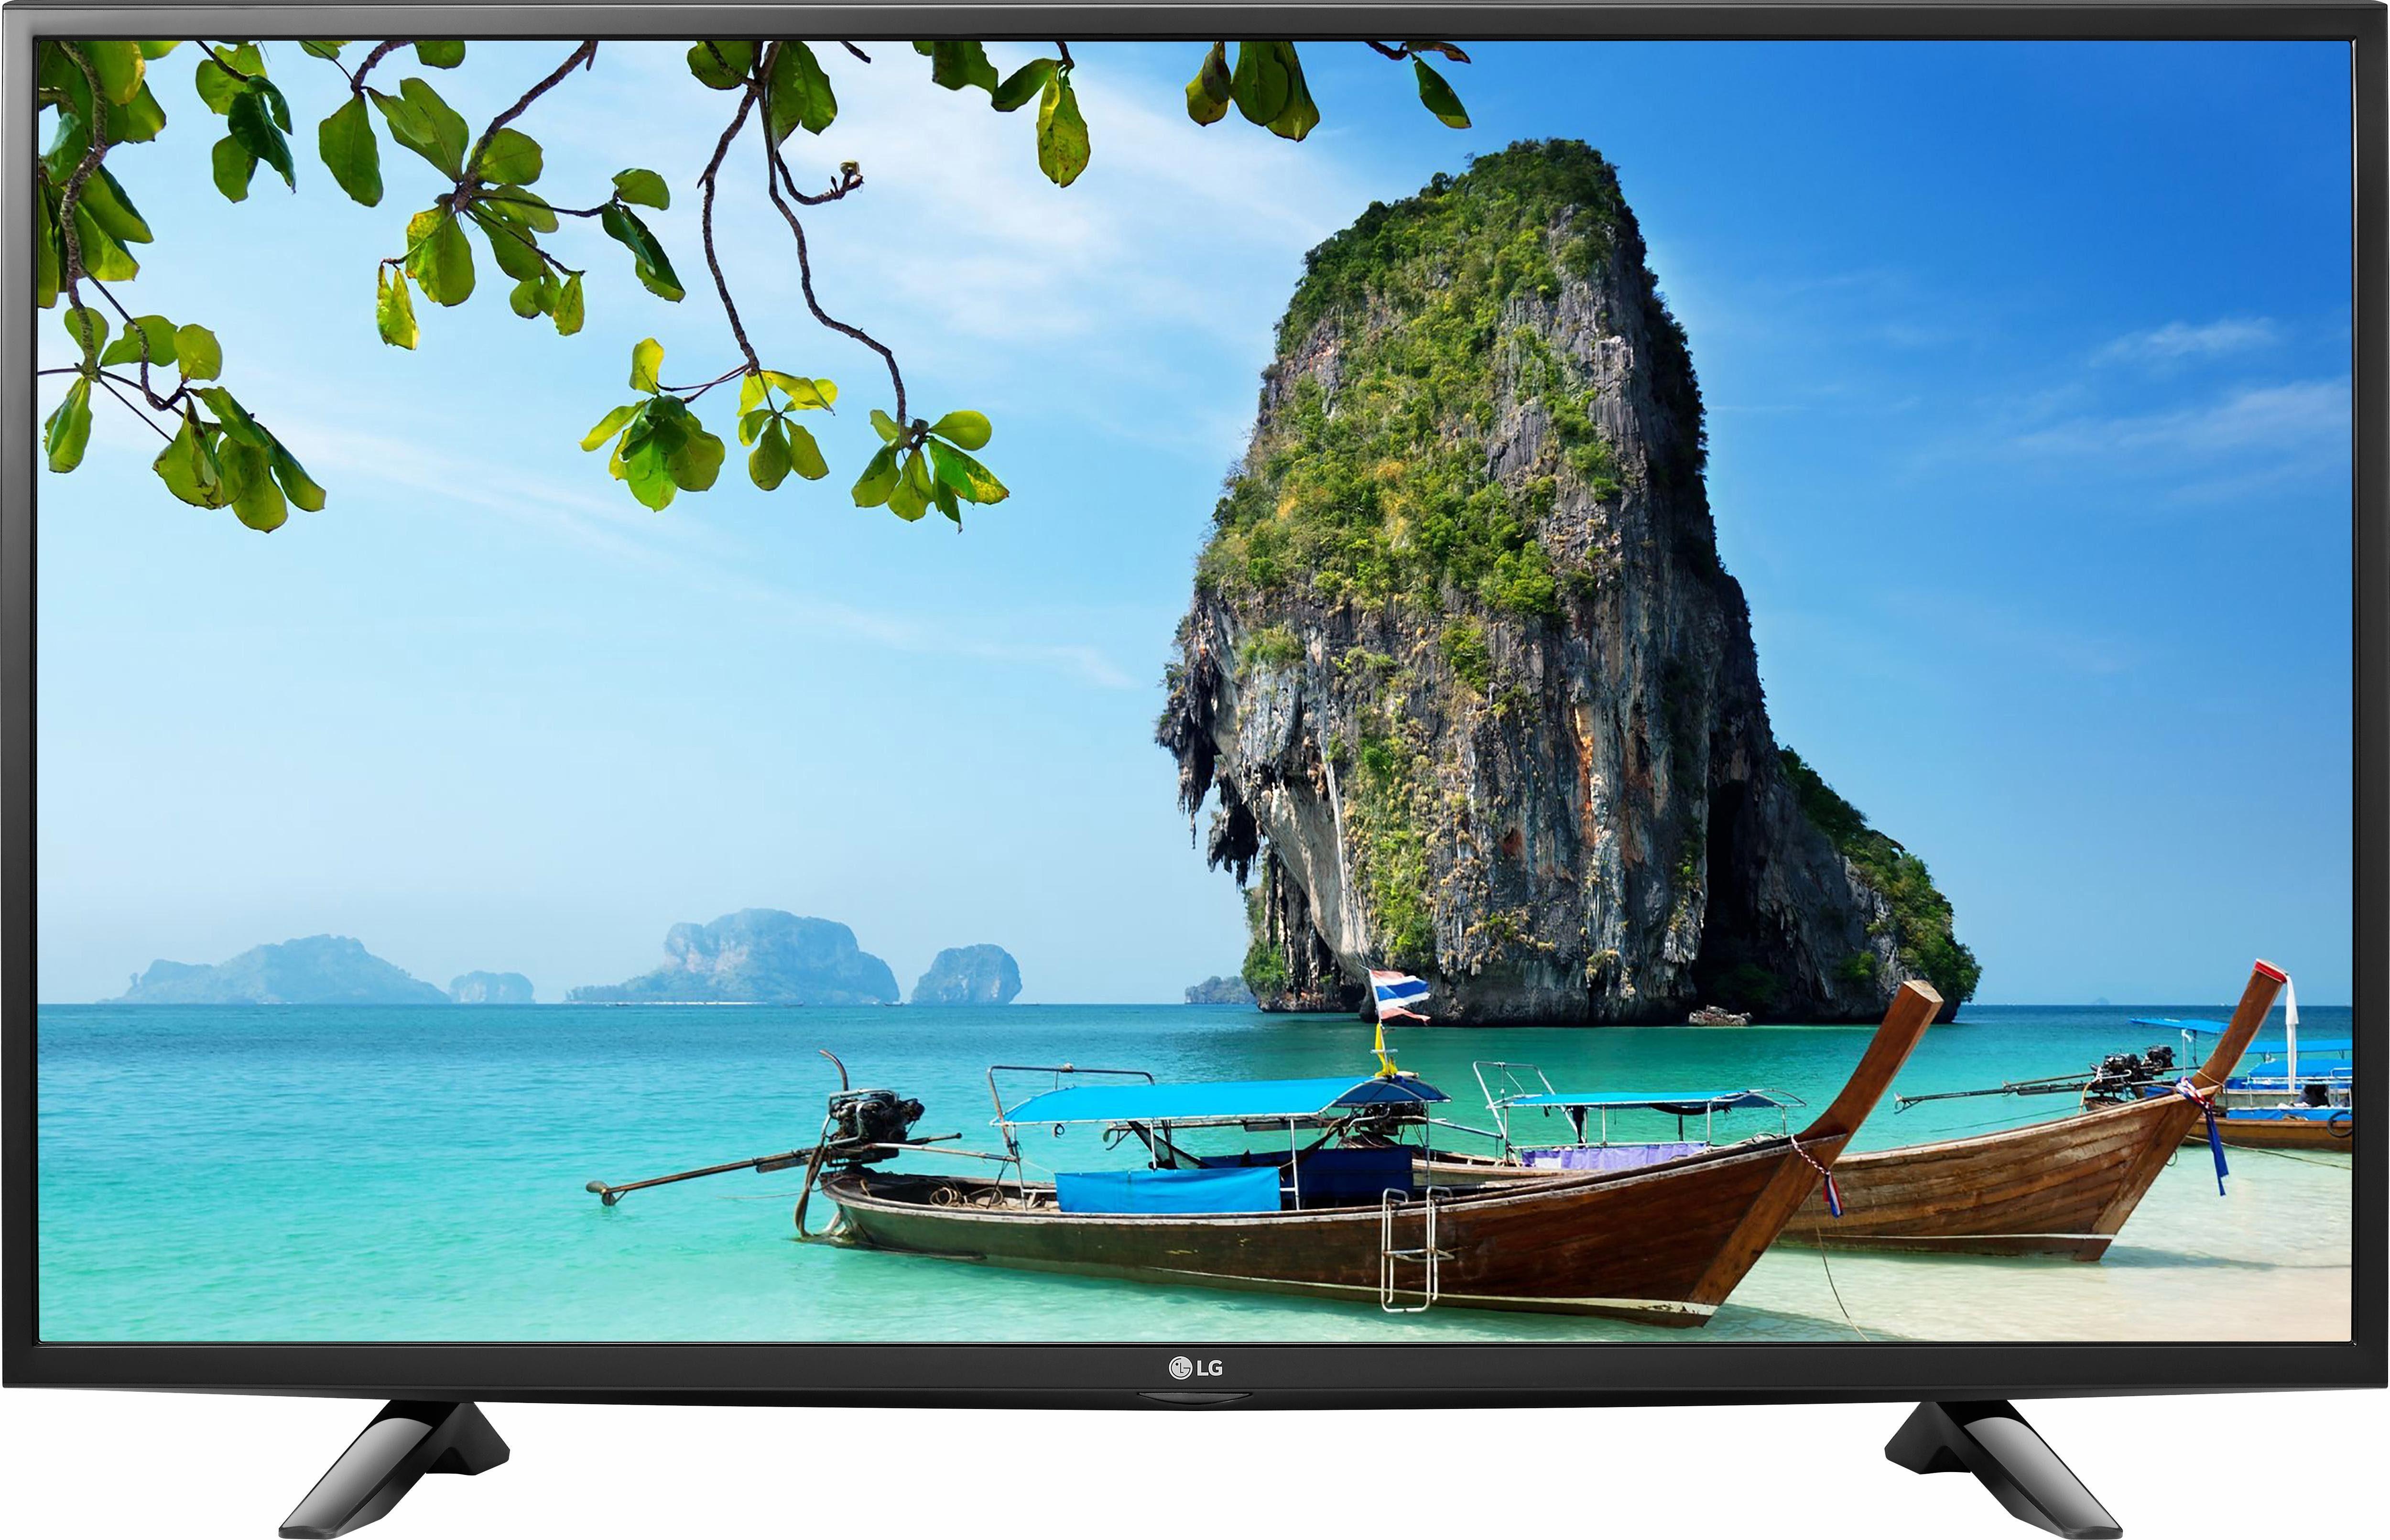 LG 49LH510V, LED Fernseher, 123 cm (49 Zoll), 1080p (Full HD)